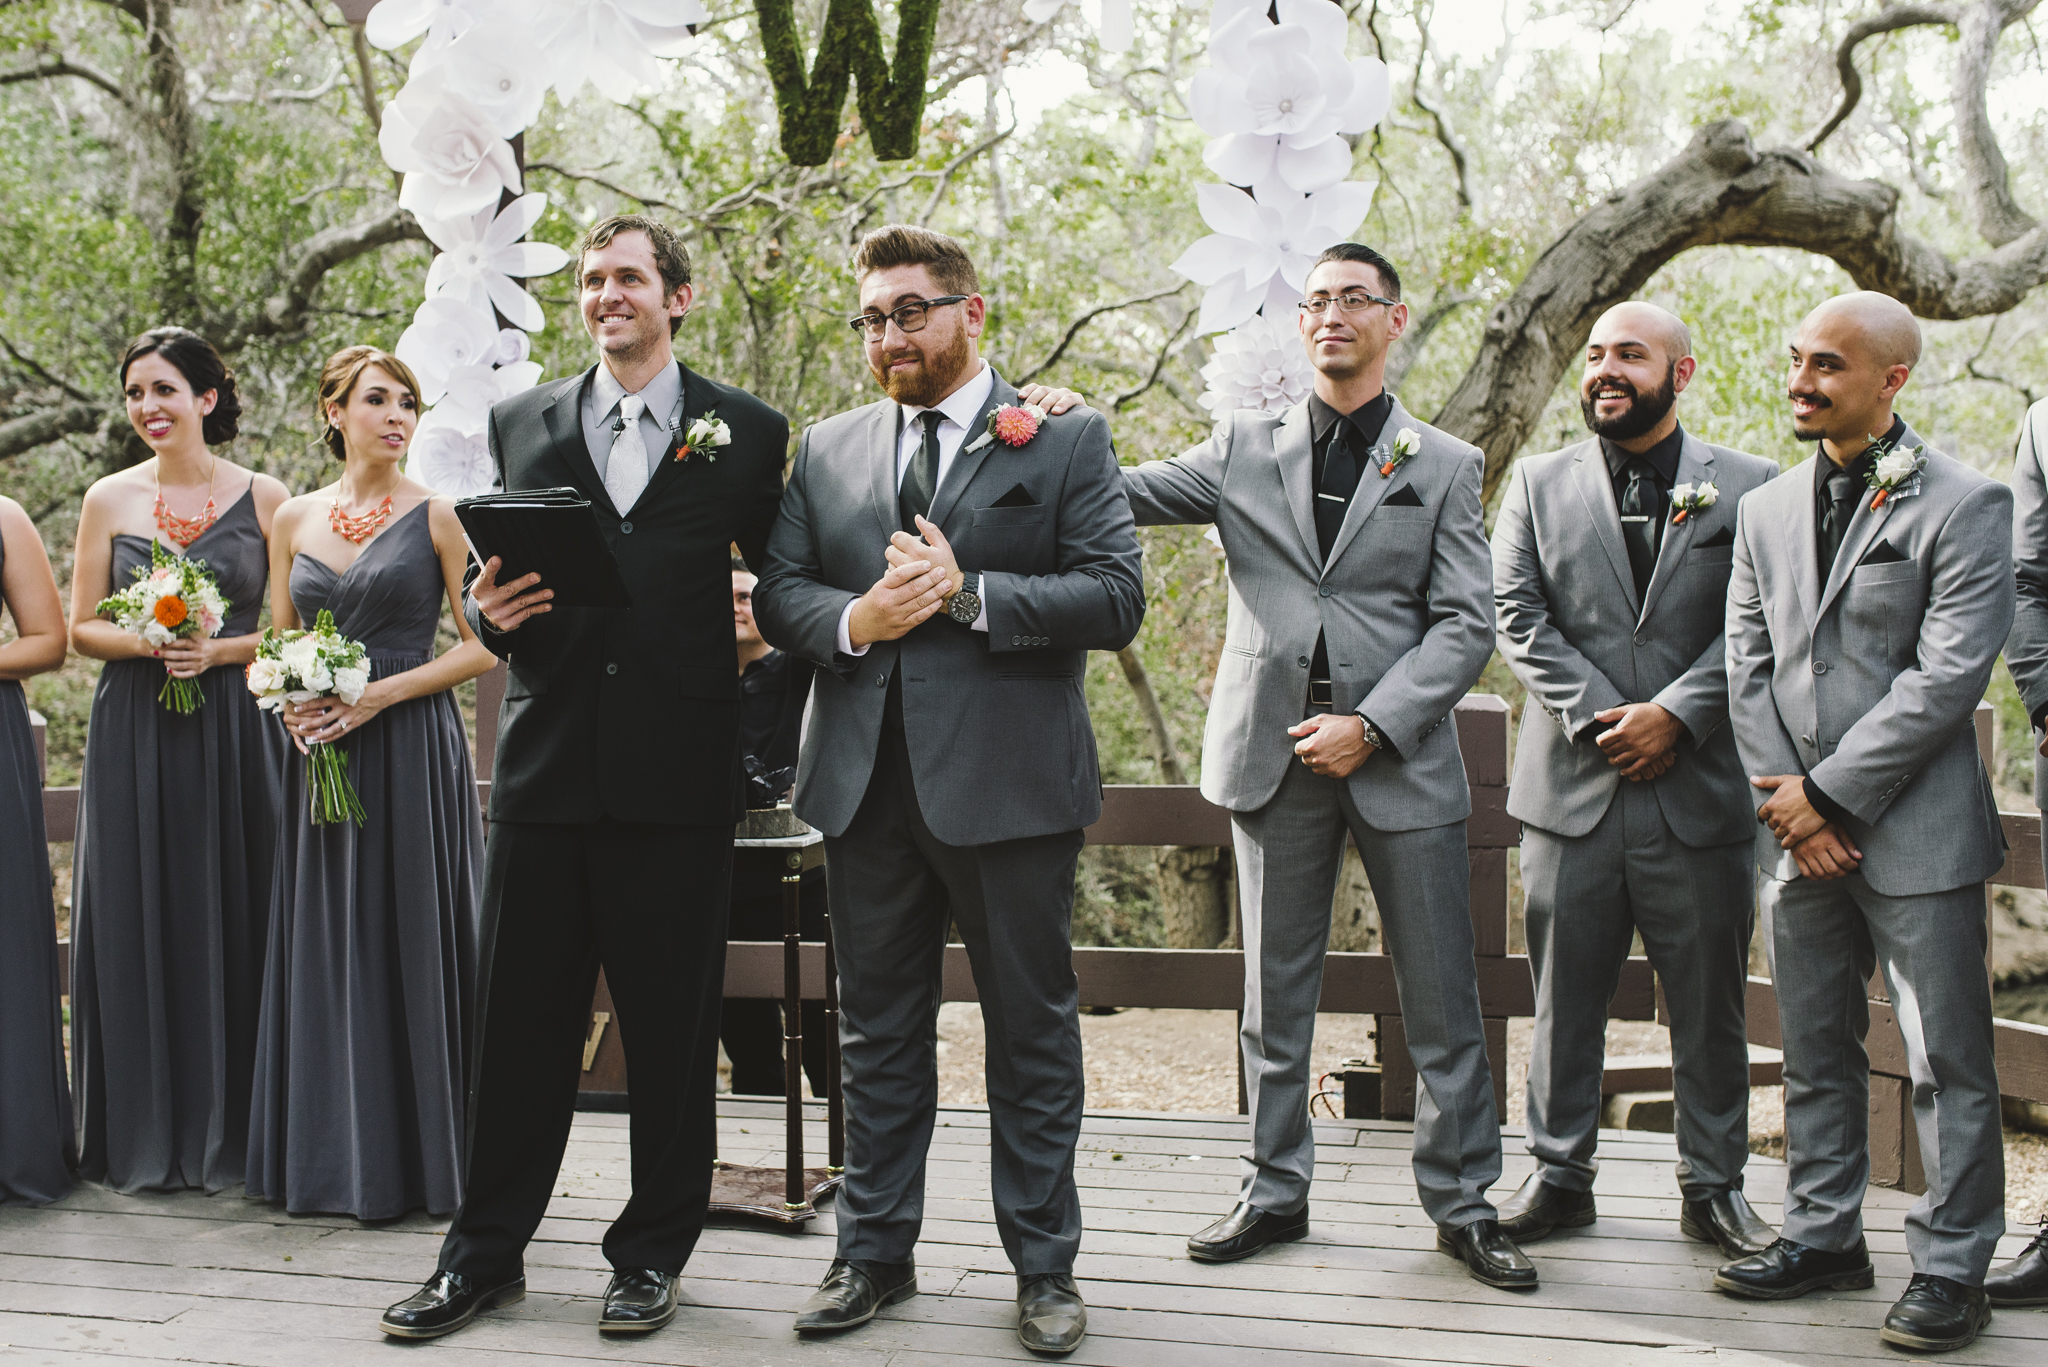 Isaiah & Taylor Photography - Los Angeles Lifestyle Wedding Photographer-9.jpg